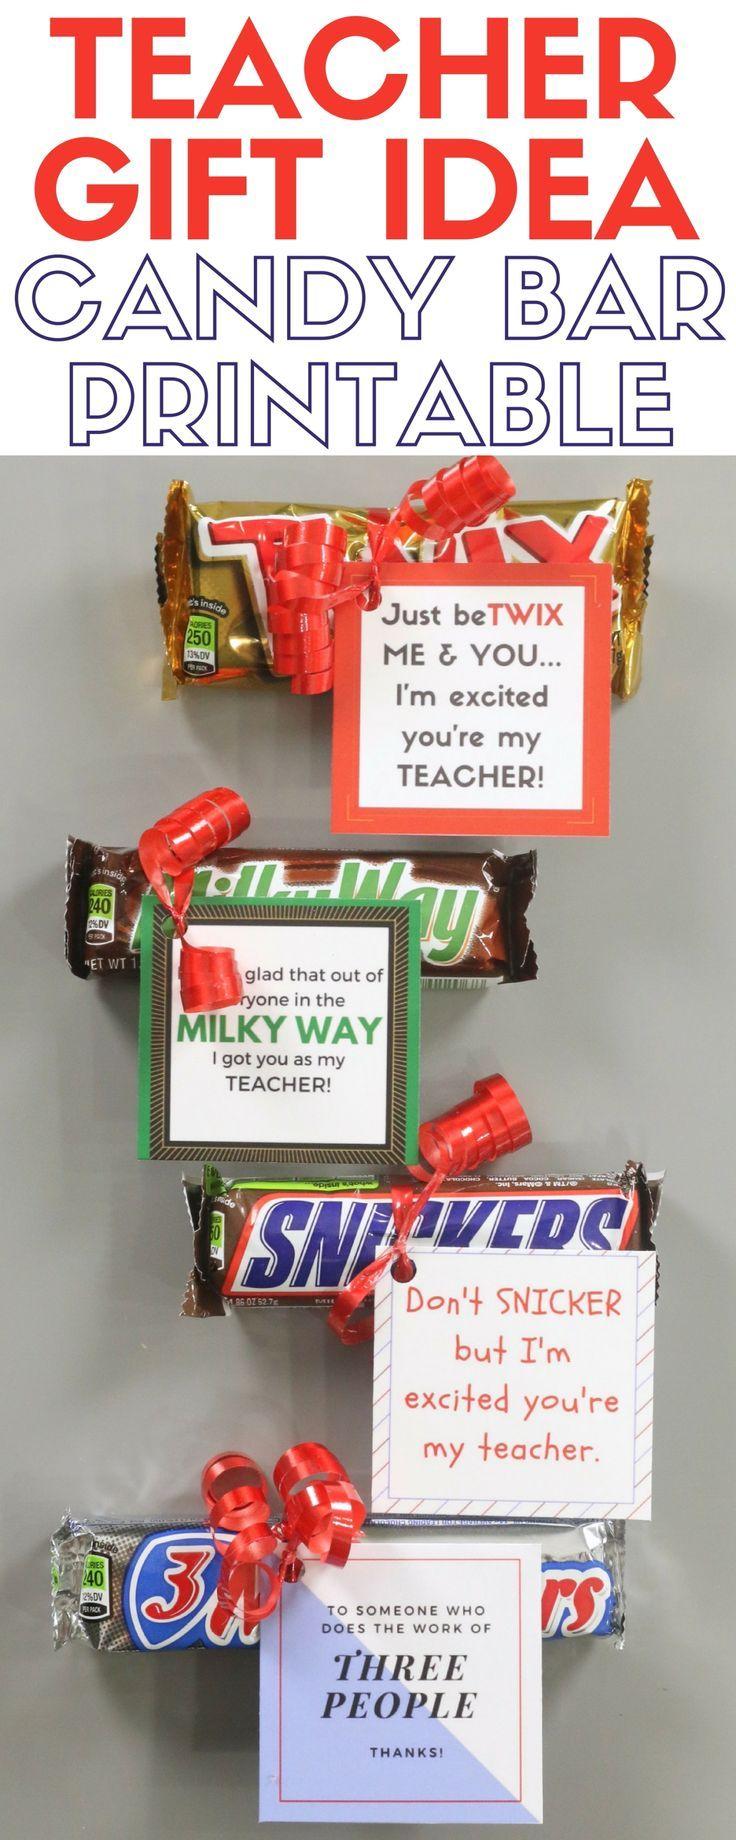 212 best images about Teacher Gift Ideas on Pinterest   Teaching ...